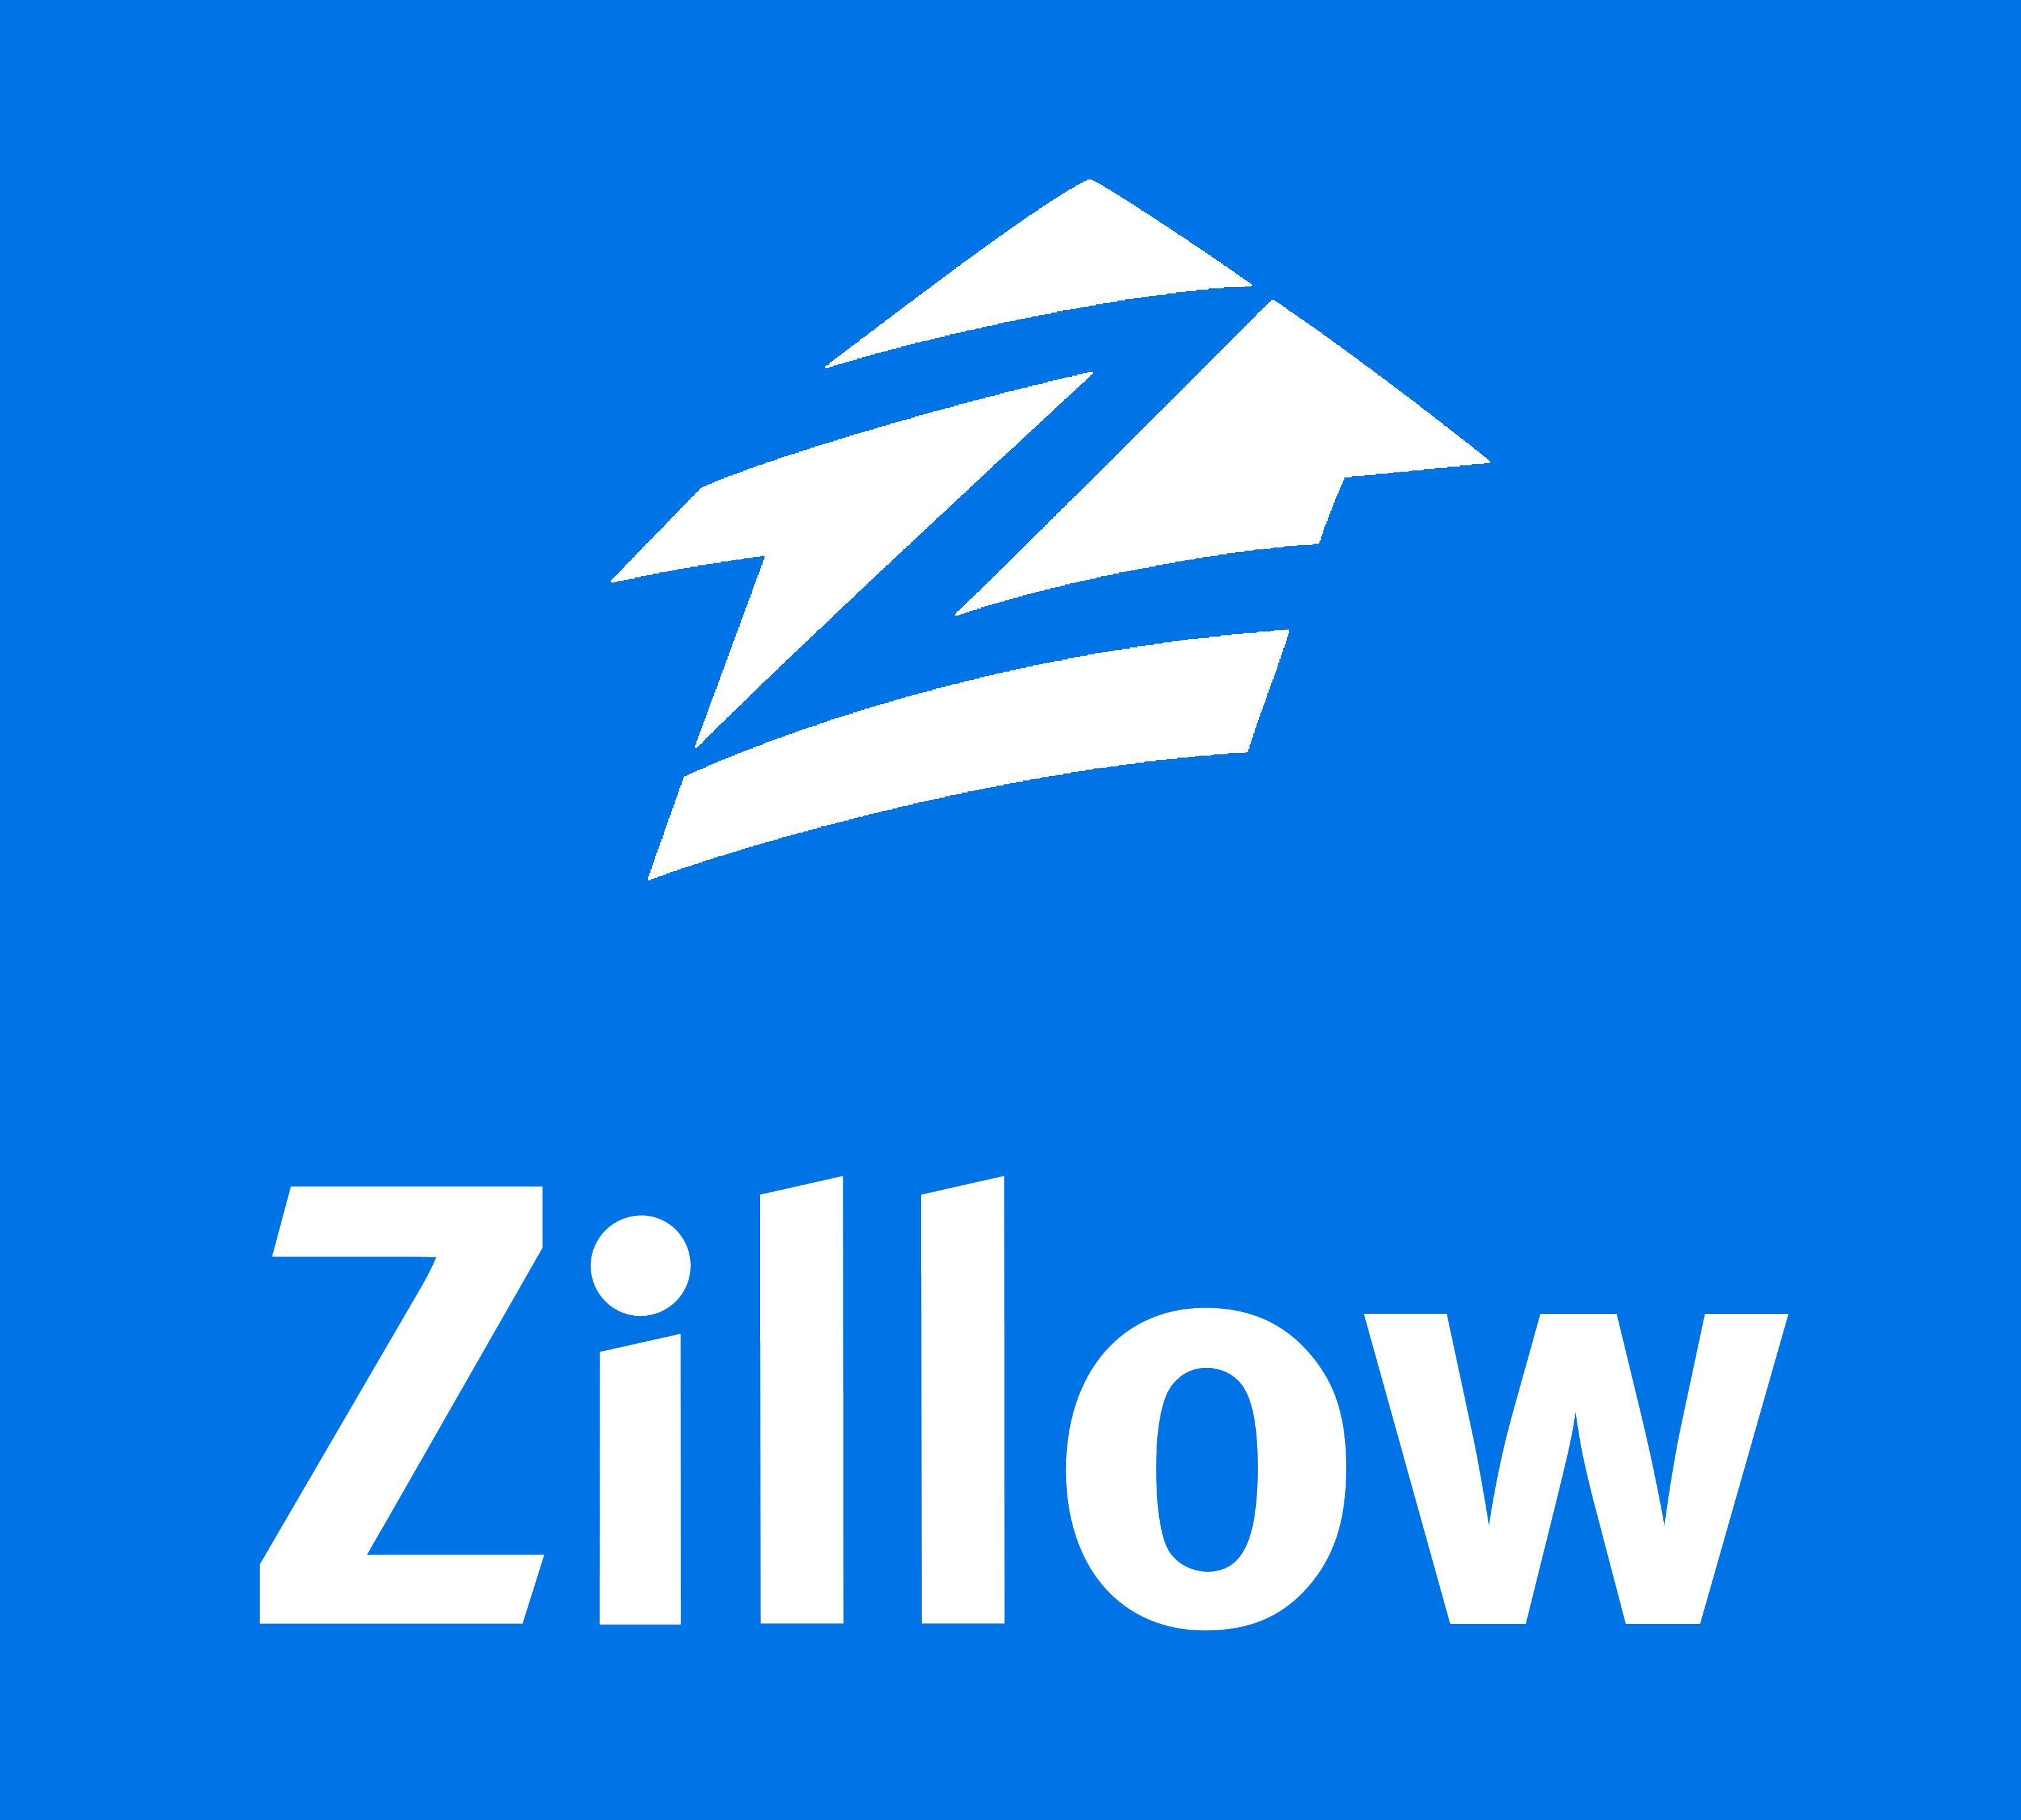 Zillow (zillow.com).